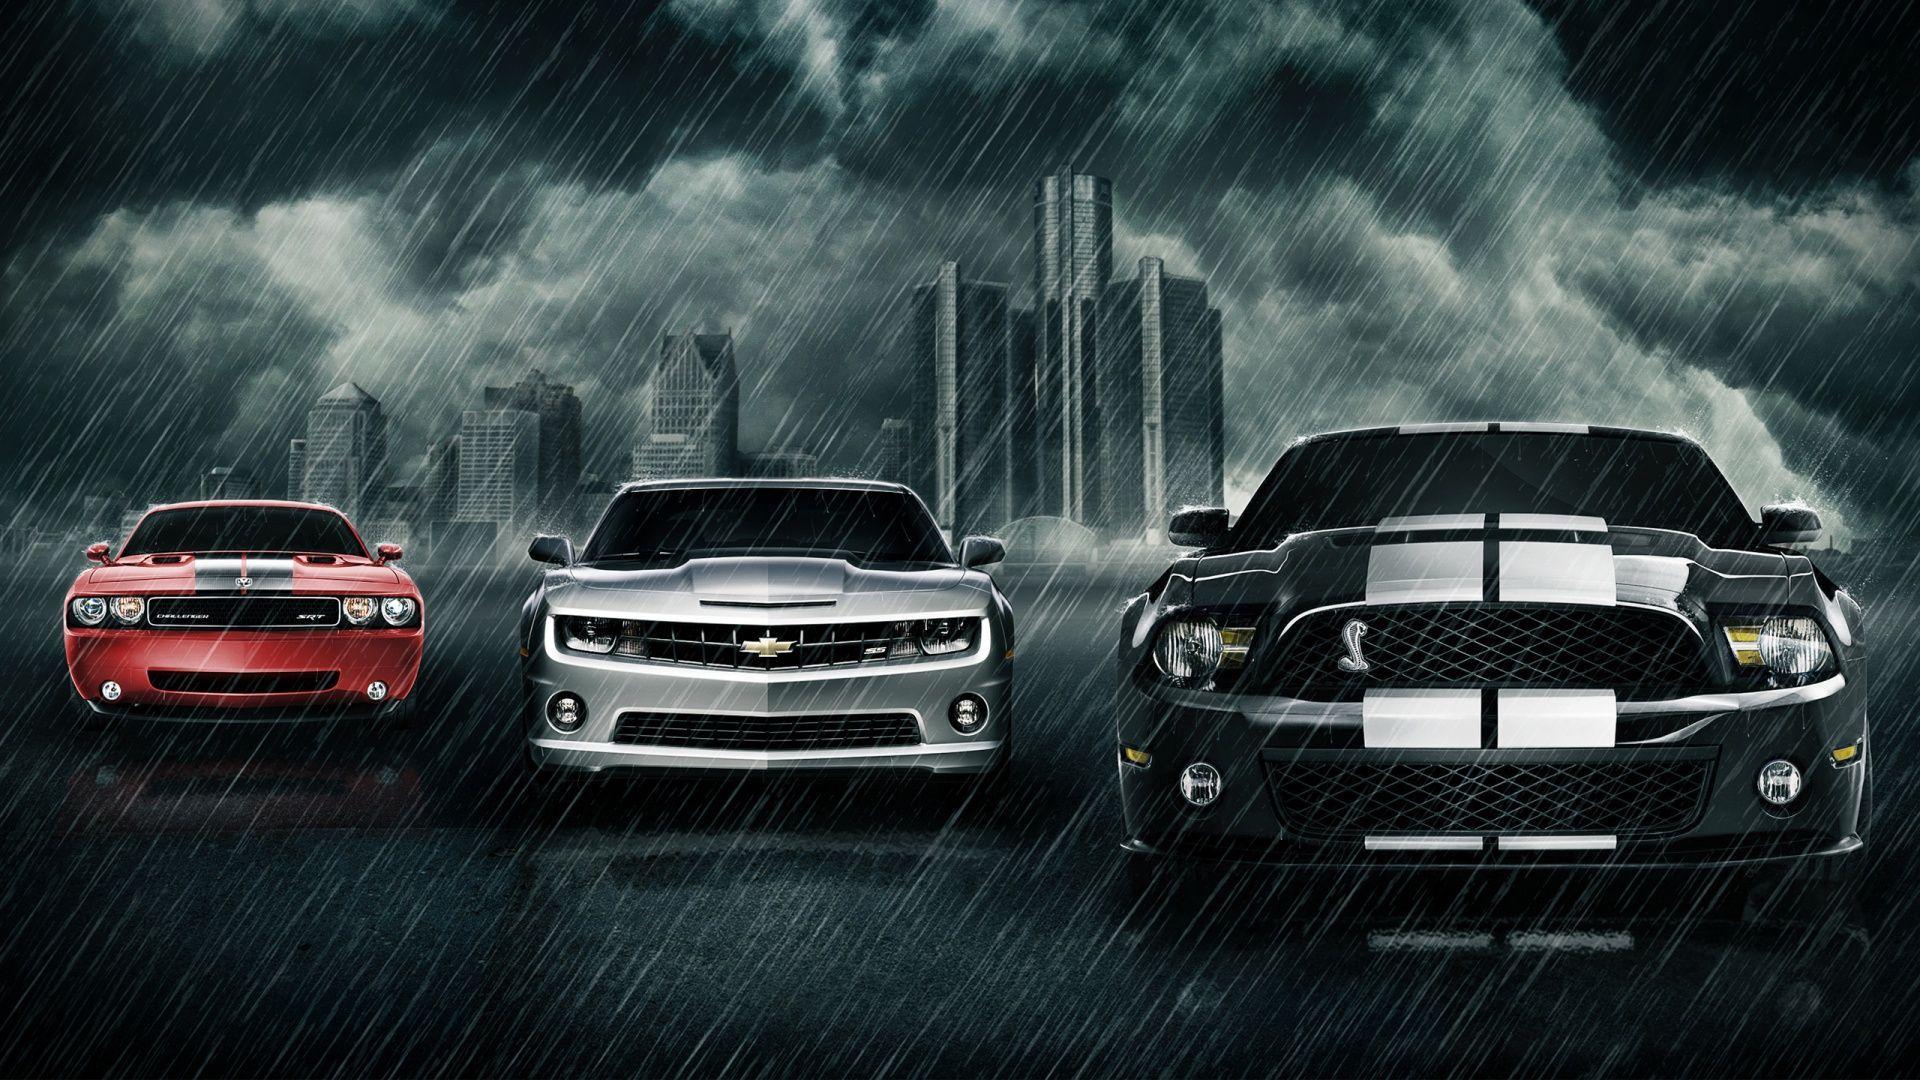 cool car images wallpaper - sf wallpaper